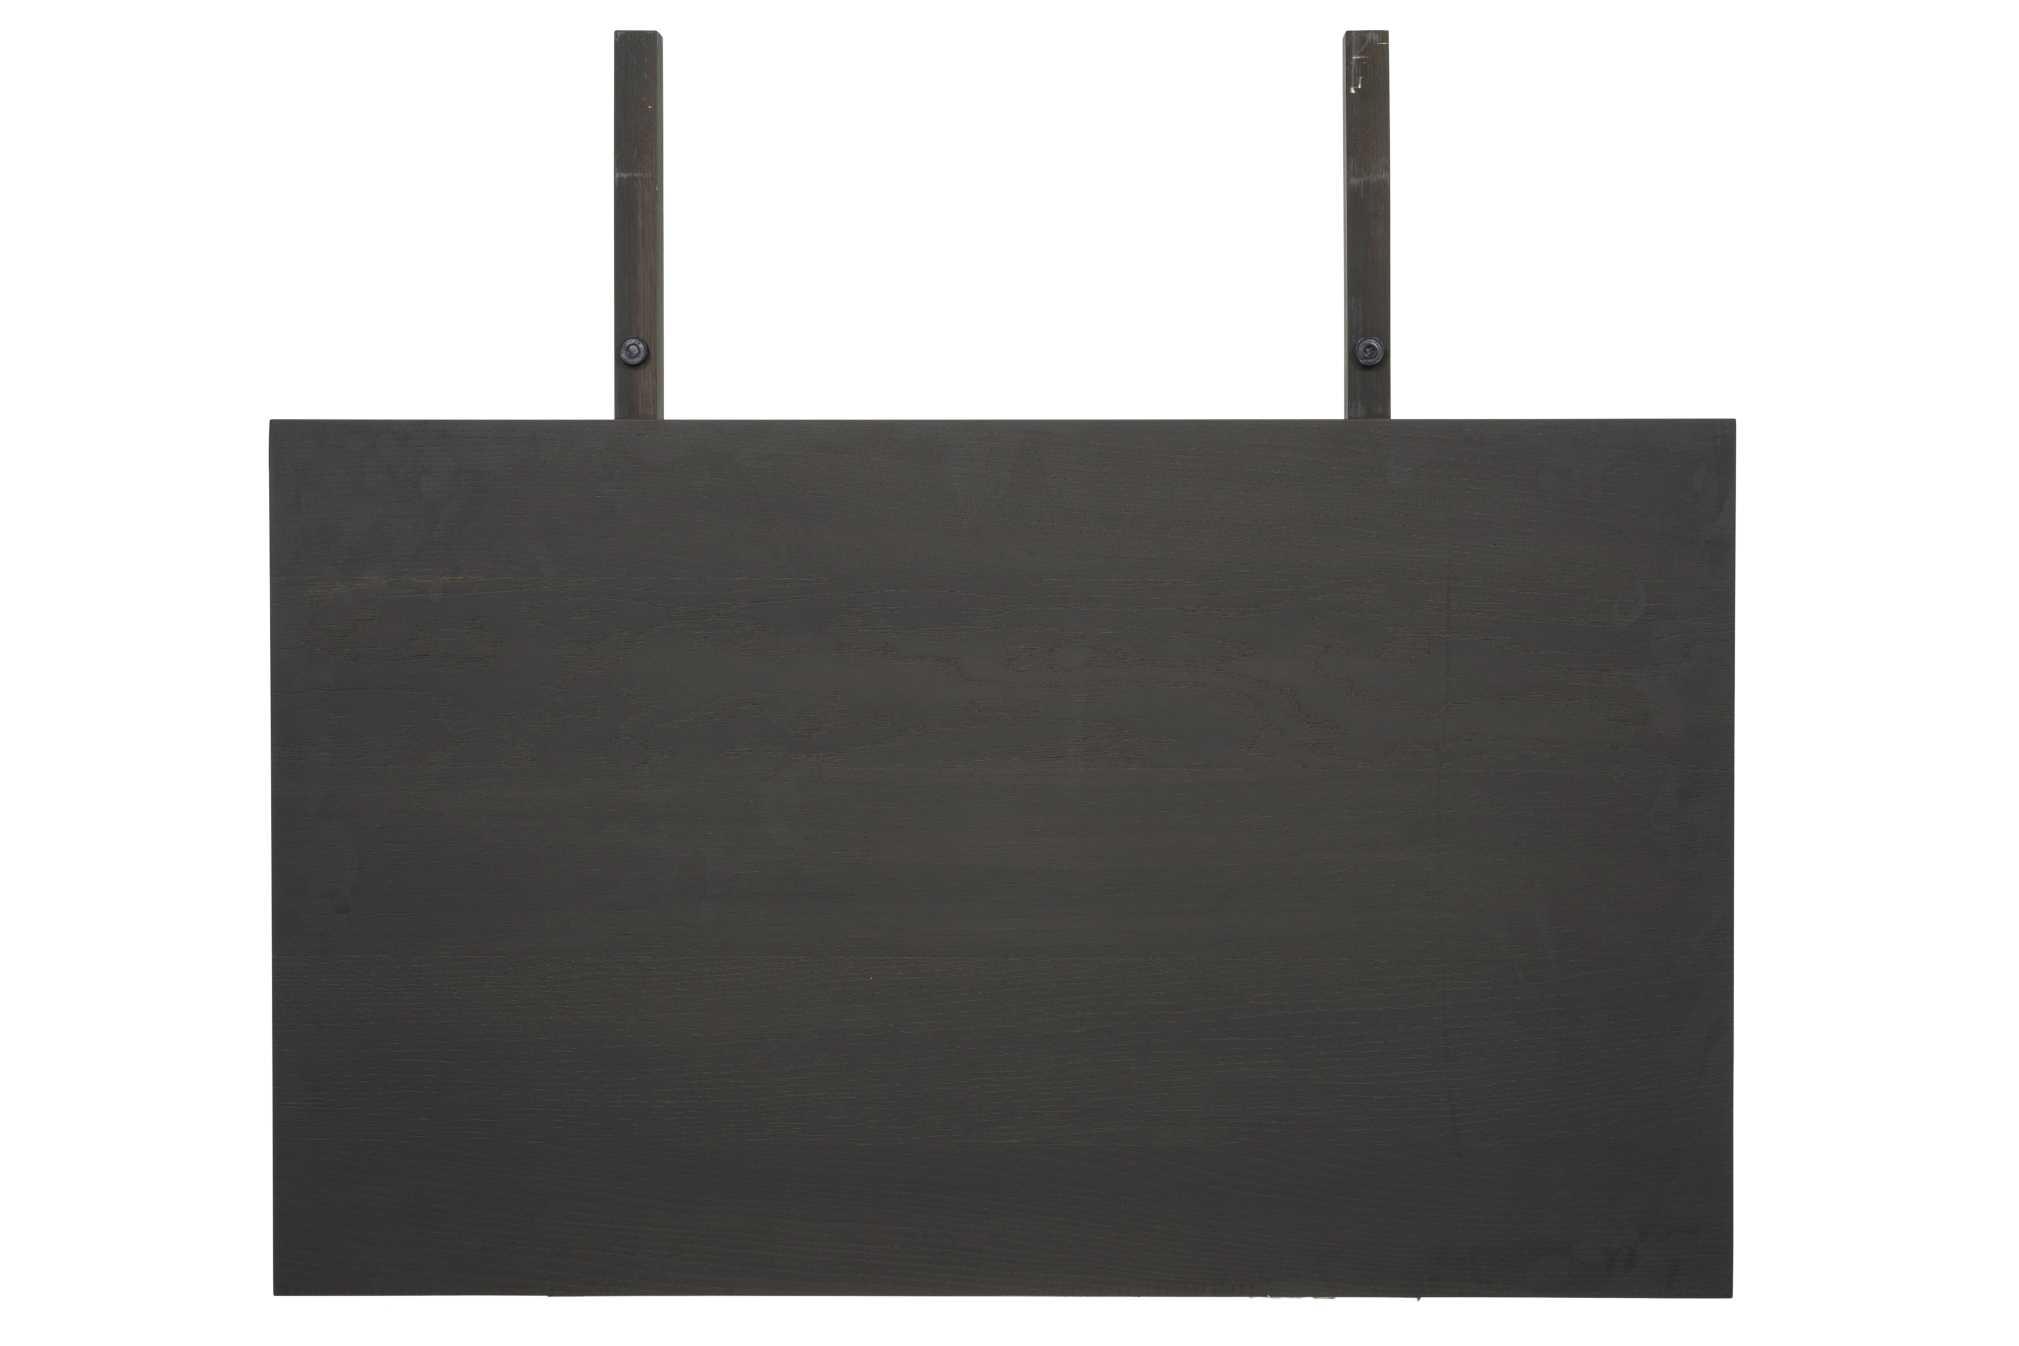 CANETT Aspen tillgsplade - antracitgr bejdset tr (100x60)